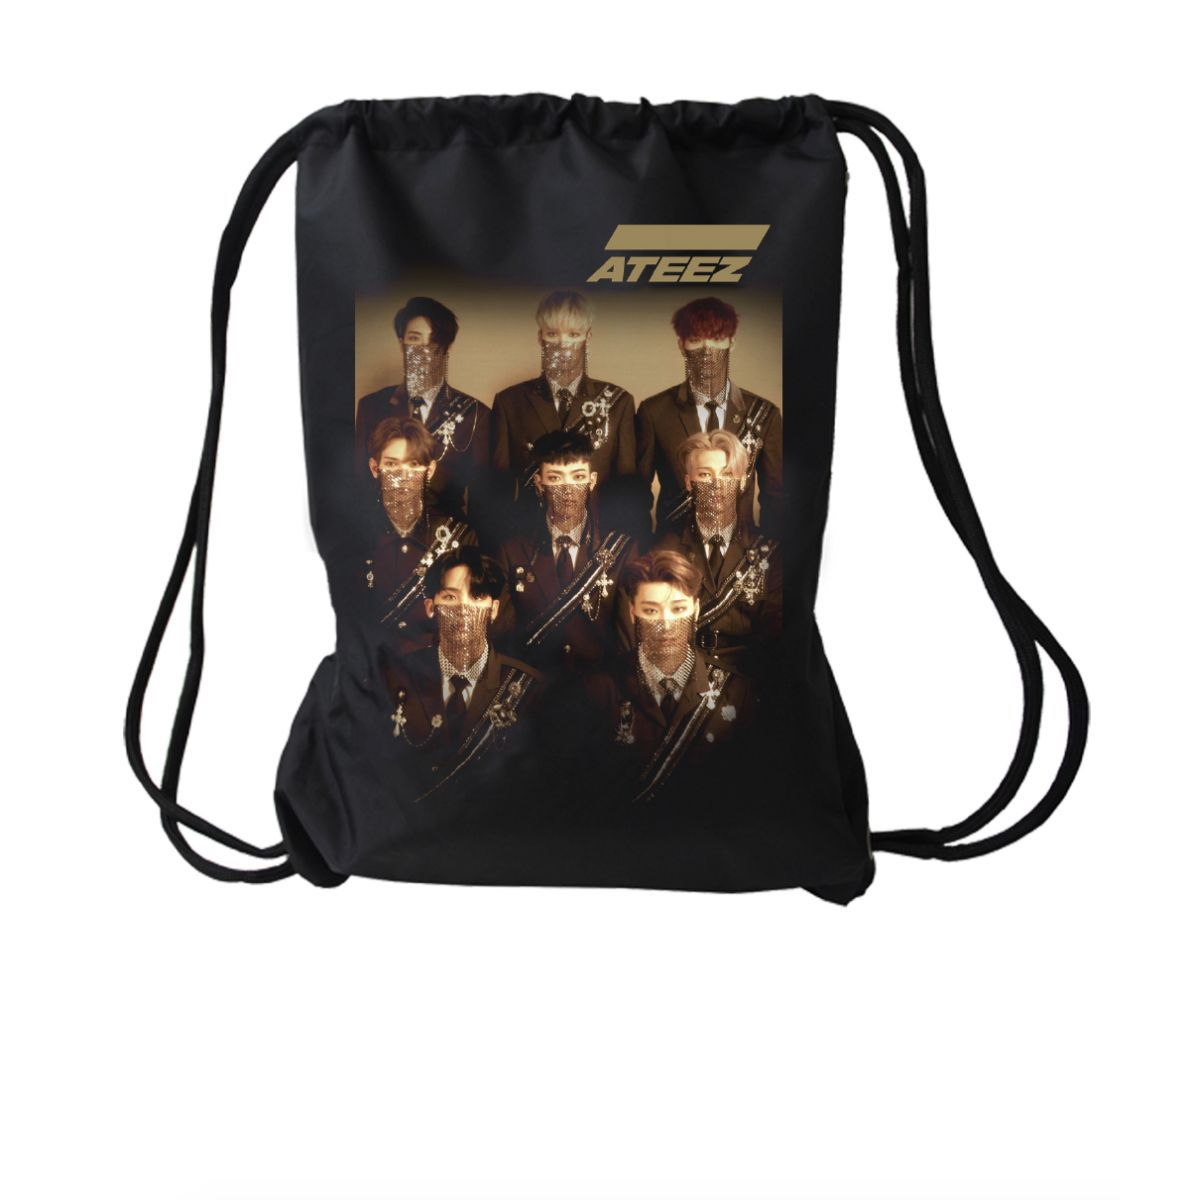 Ateez Drawstring Bag